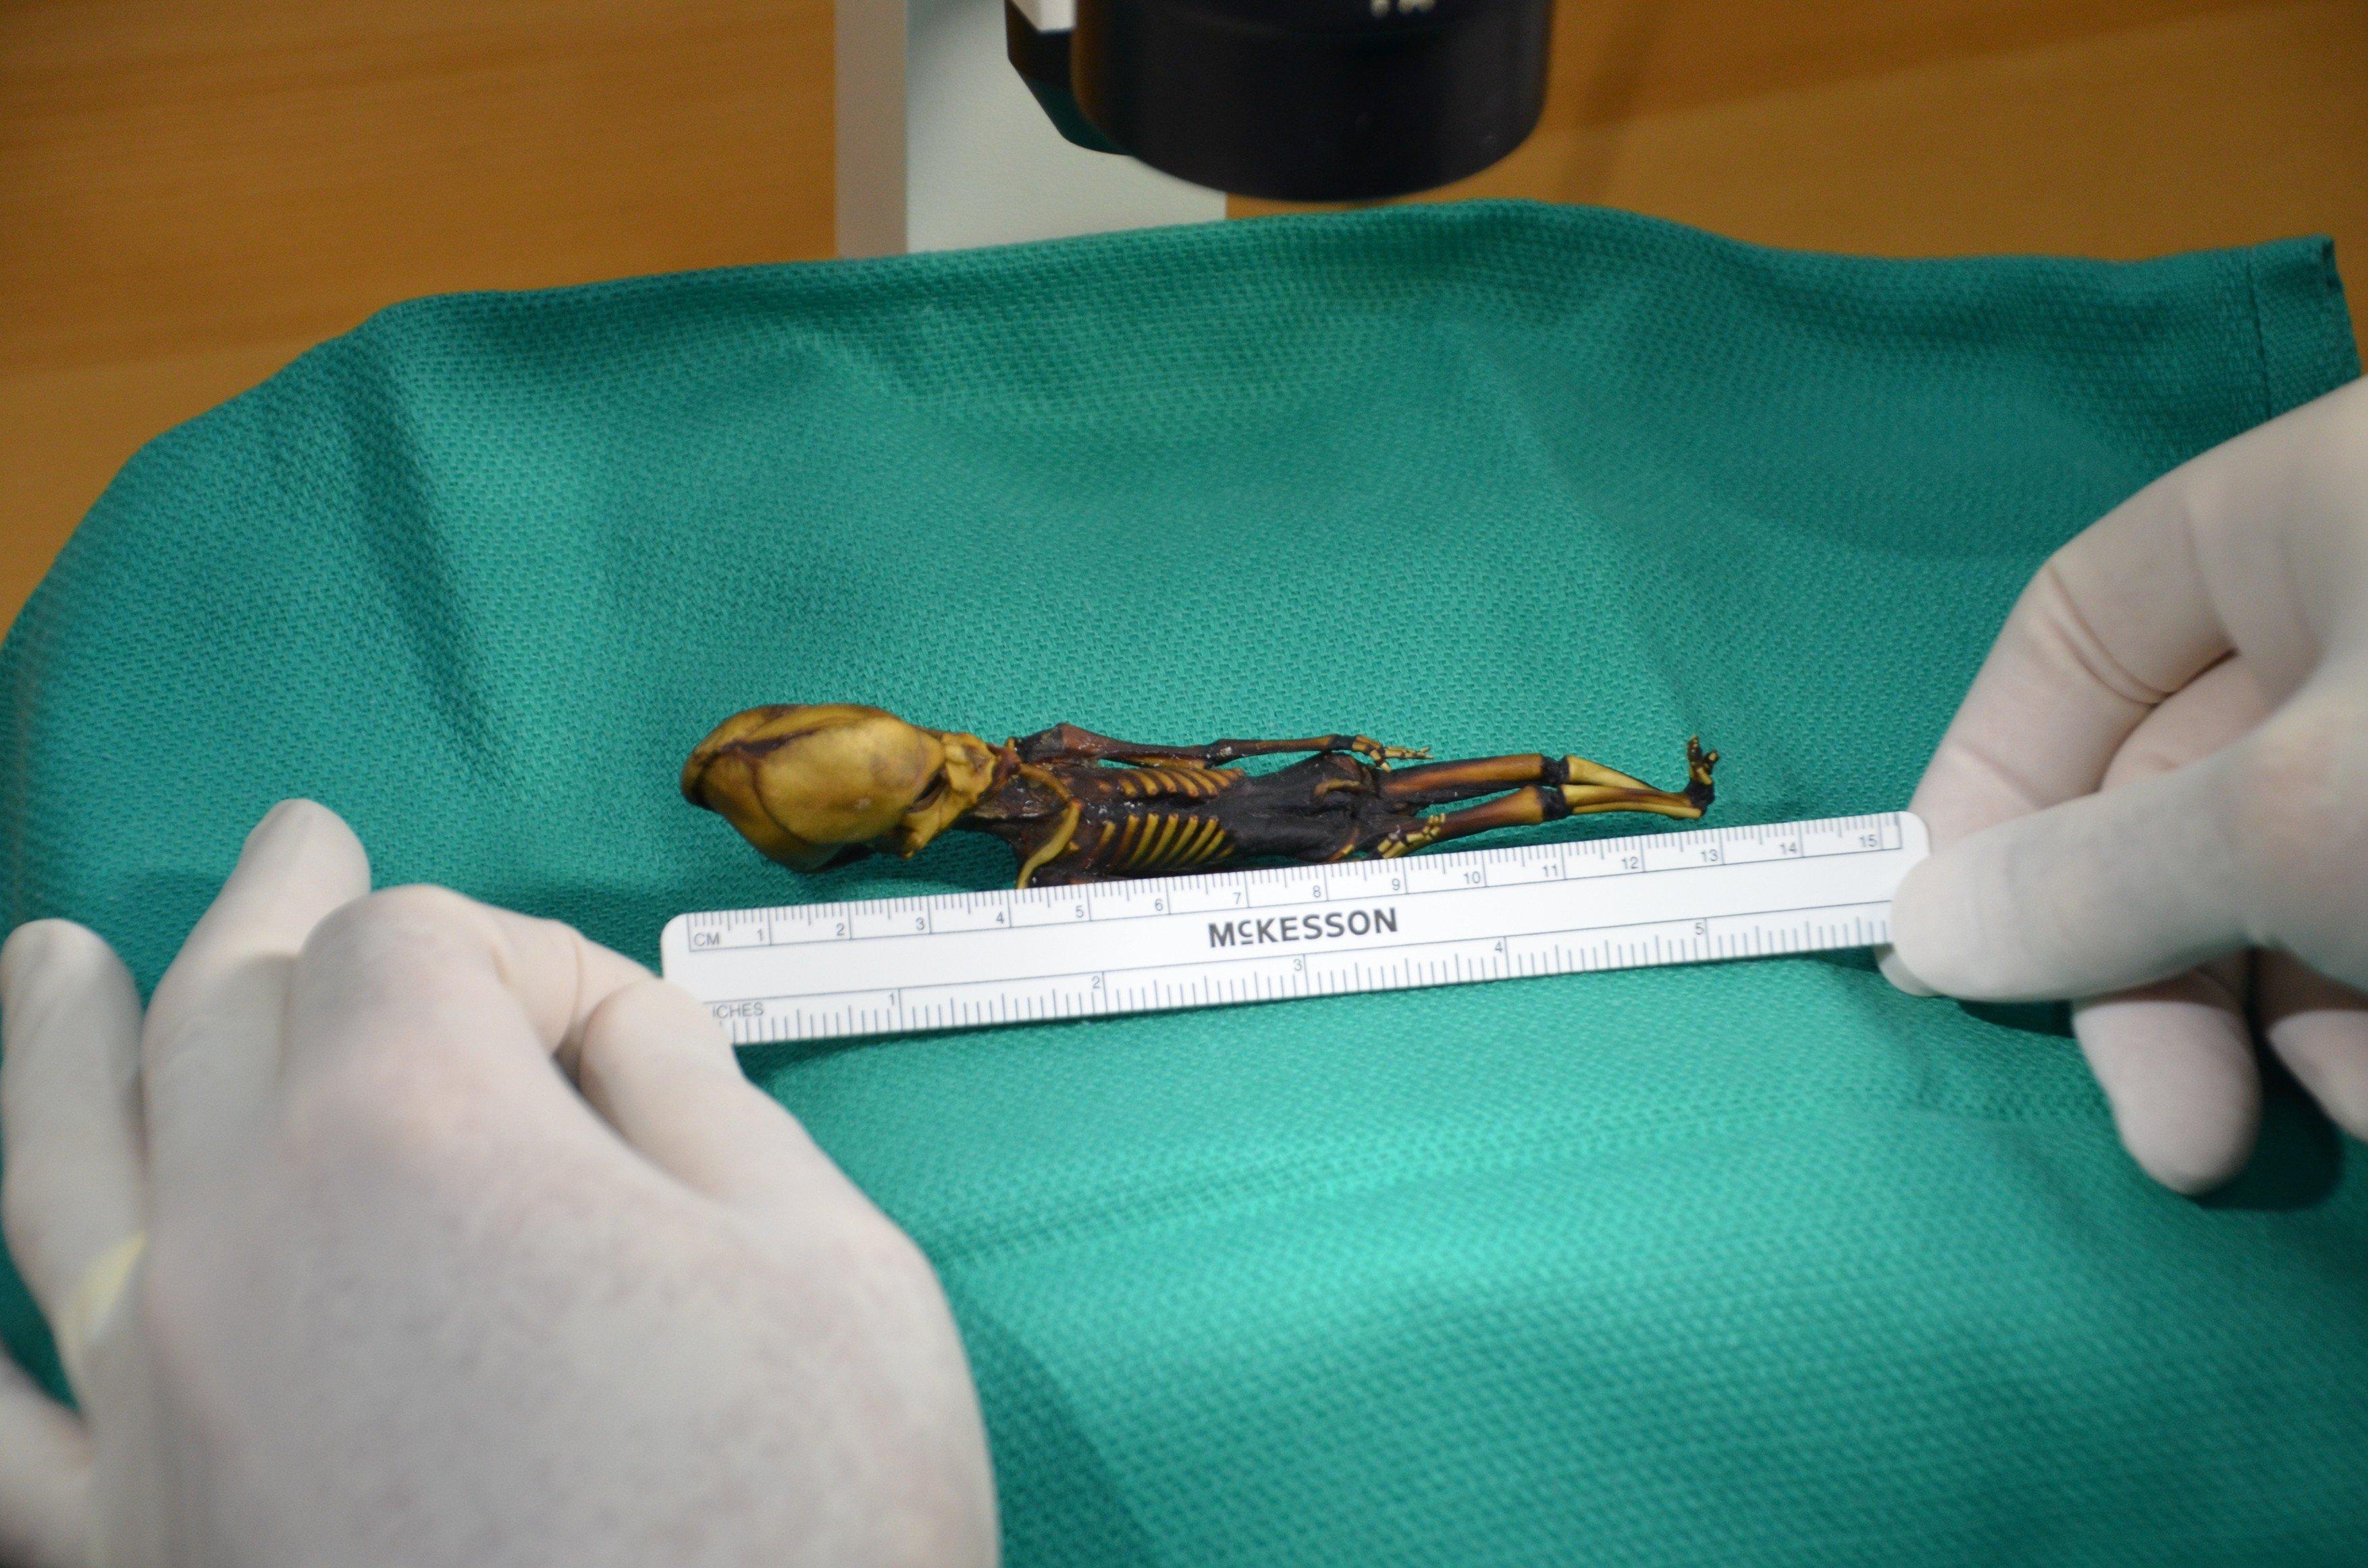 Mumie Ata